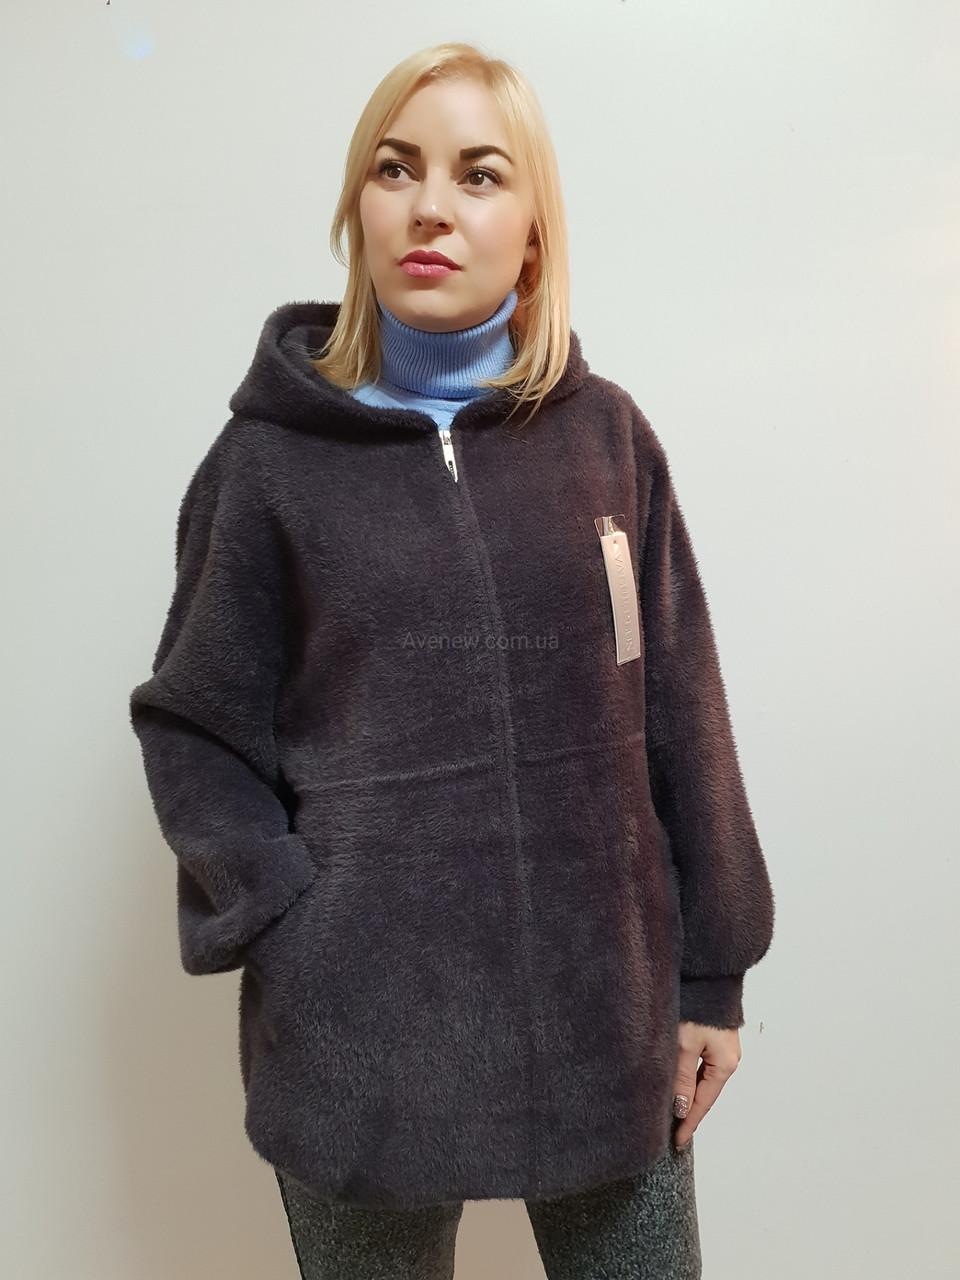 Жіноче пальто з капюшоном з вовни альпака